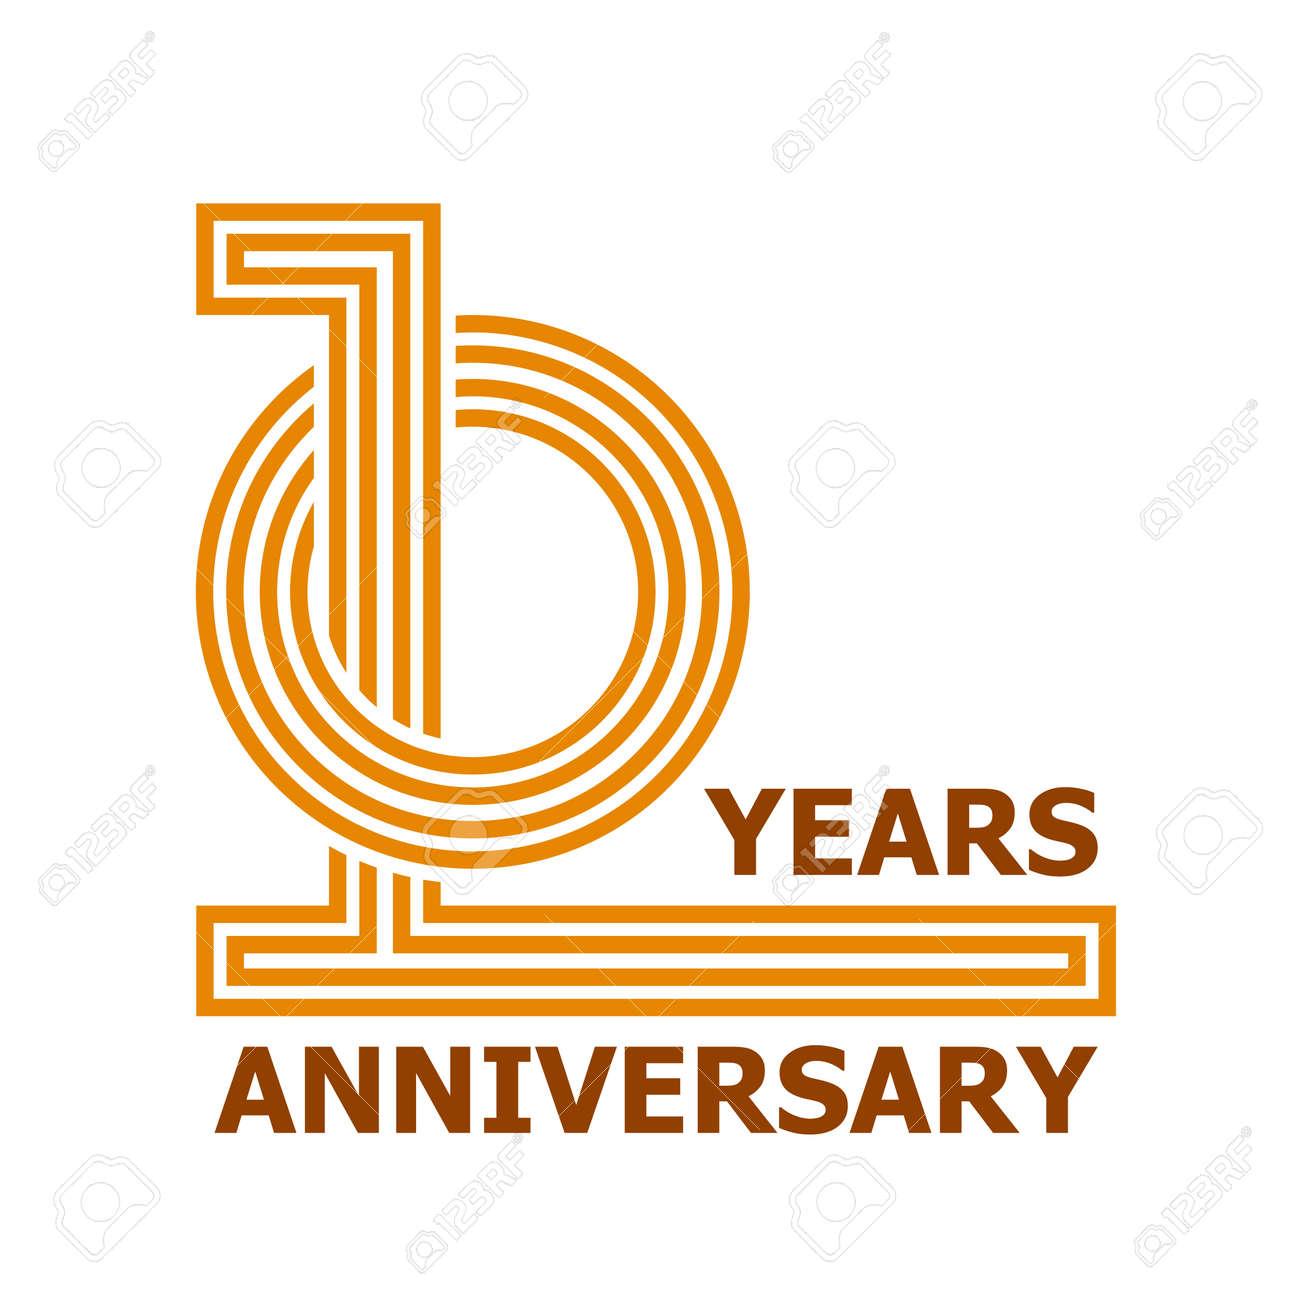 10 Years Anniversary Symbol Vector Royalty Free Cliparts Vectors